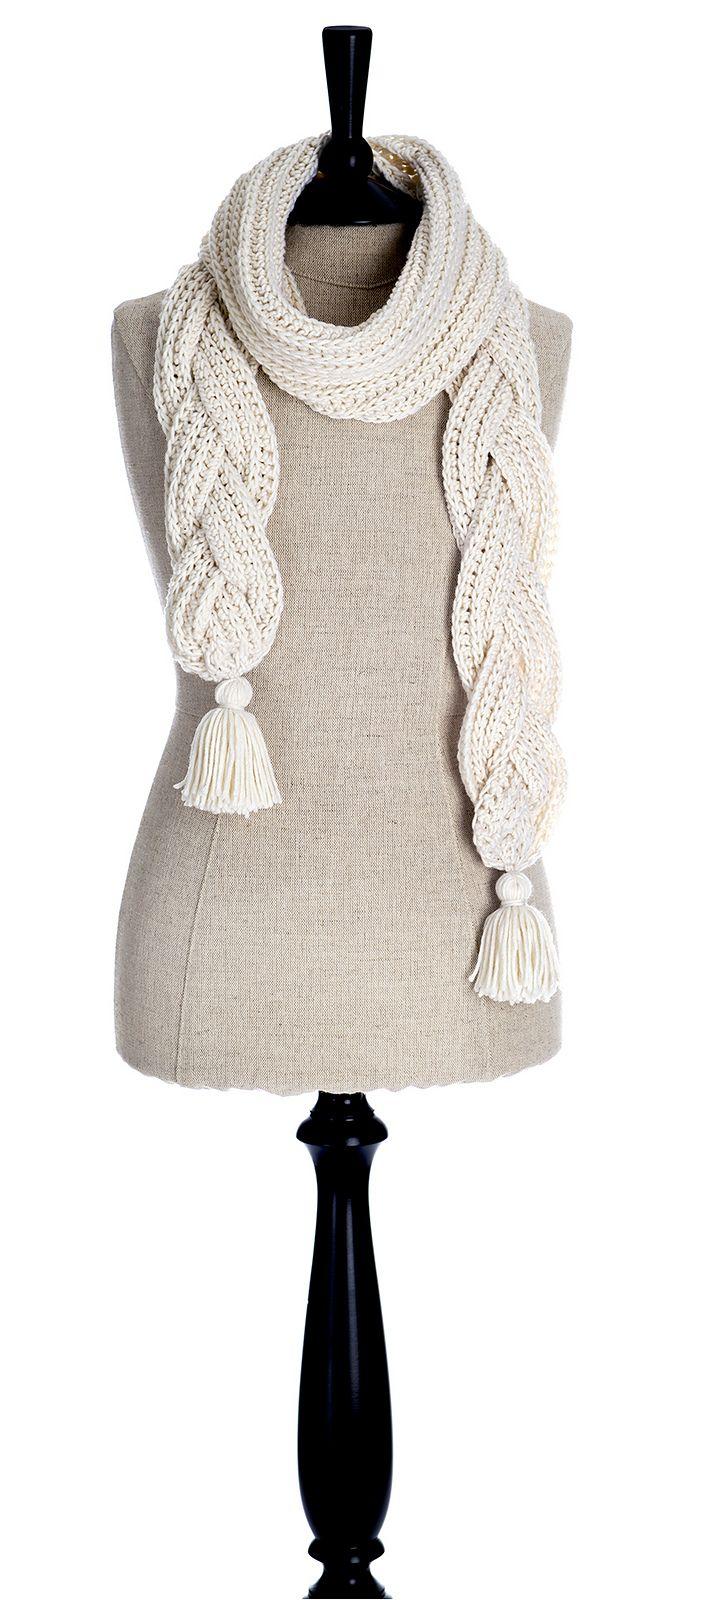 Ravelry: Crochet à la Brioche Scarf by Alla Koval